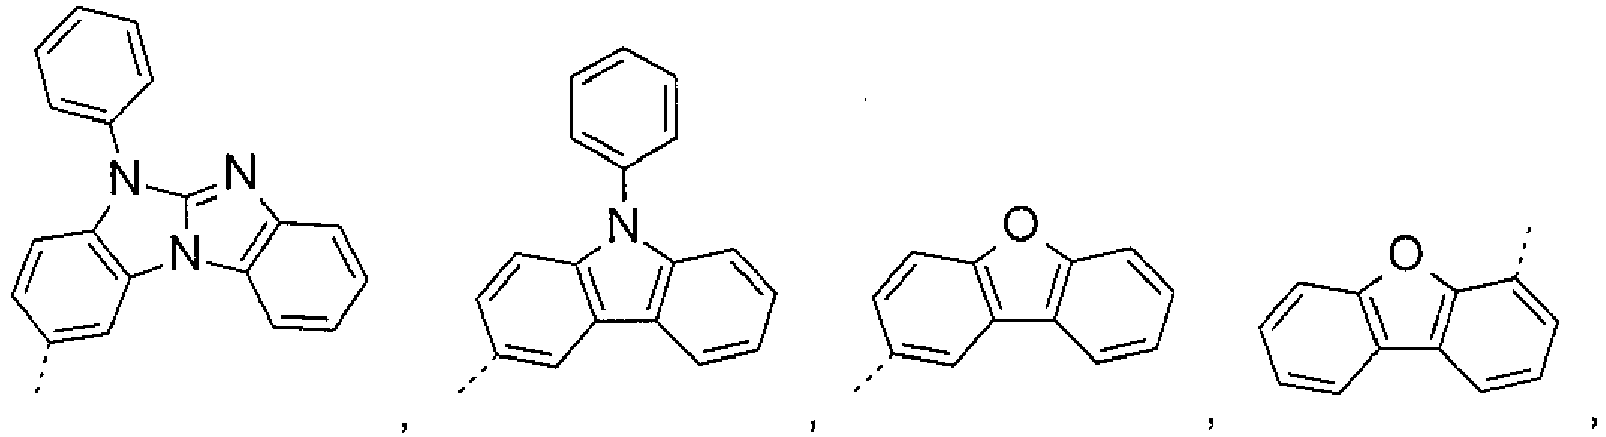 Figure imgb0746